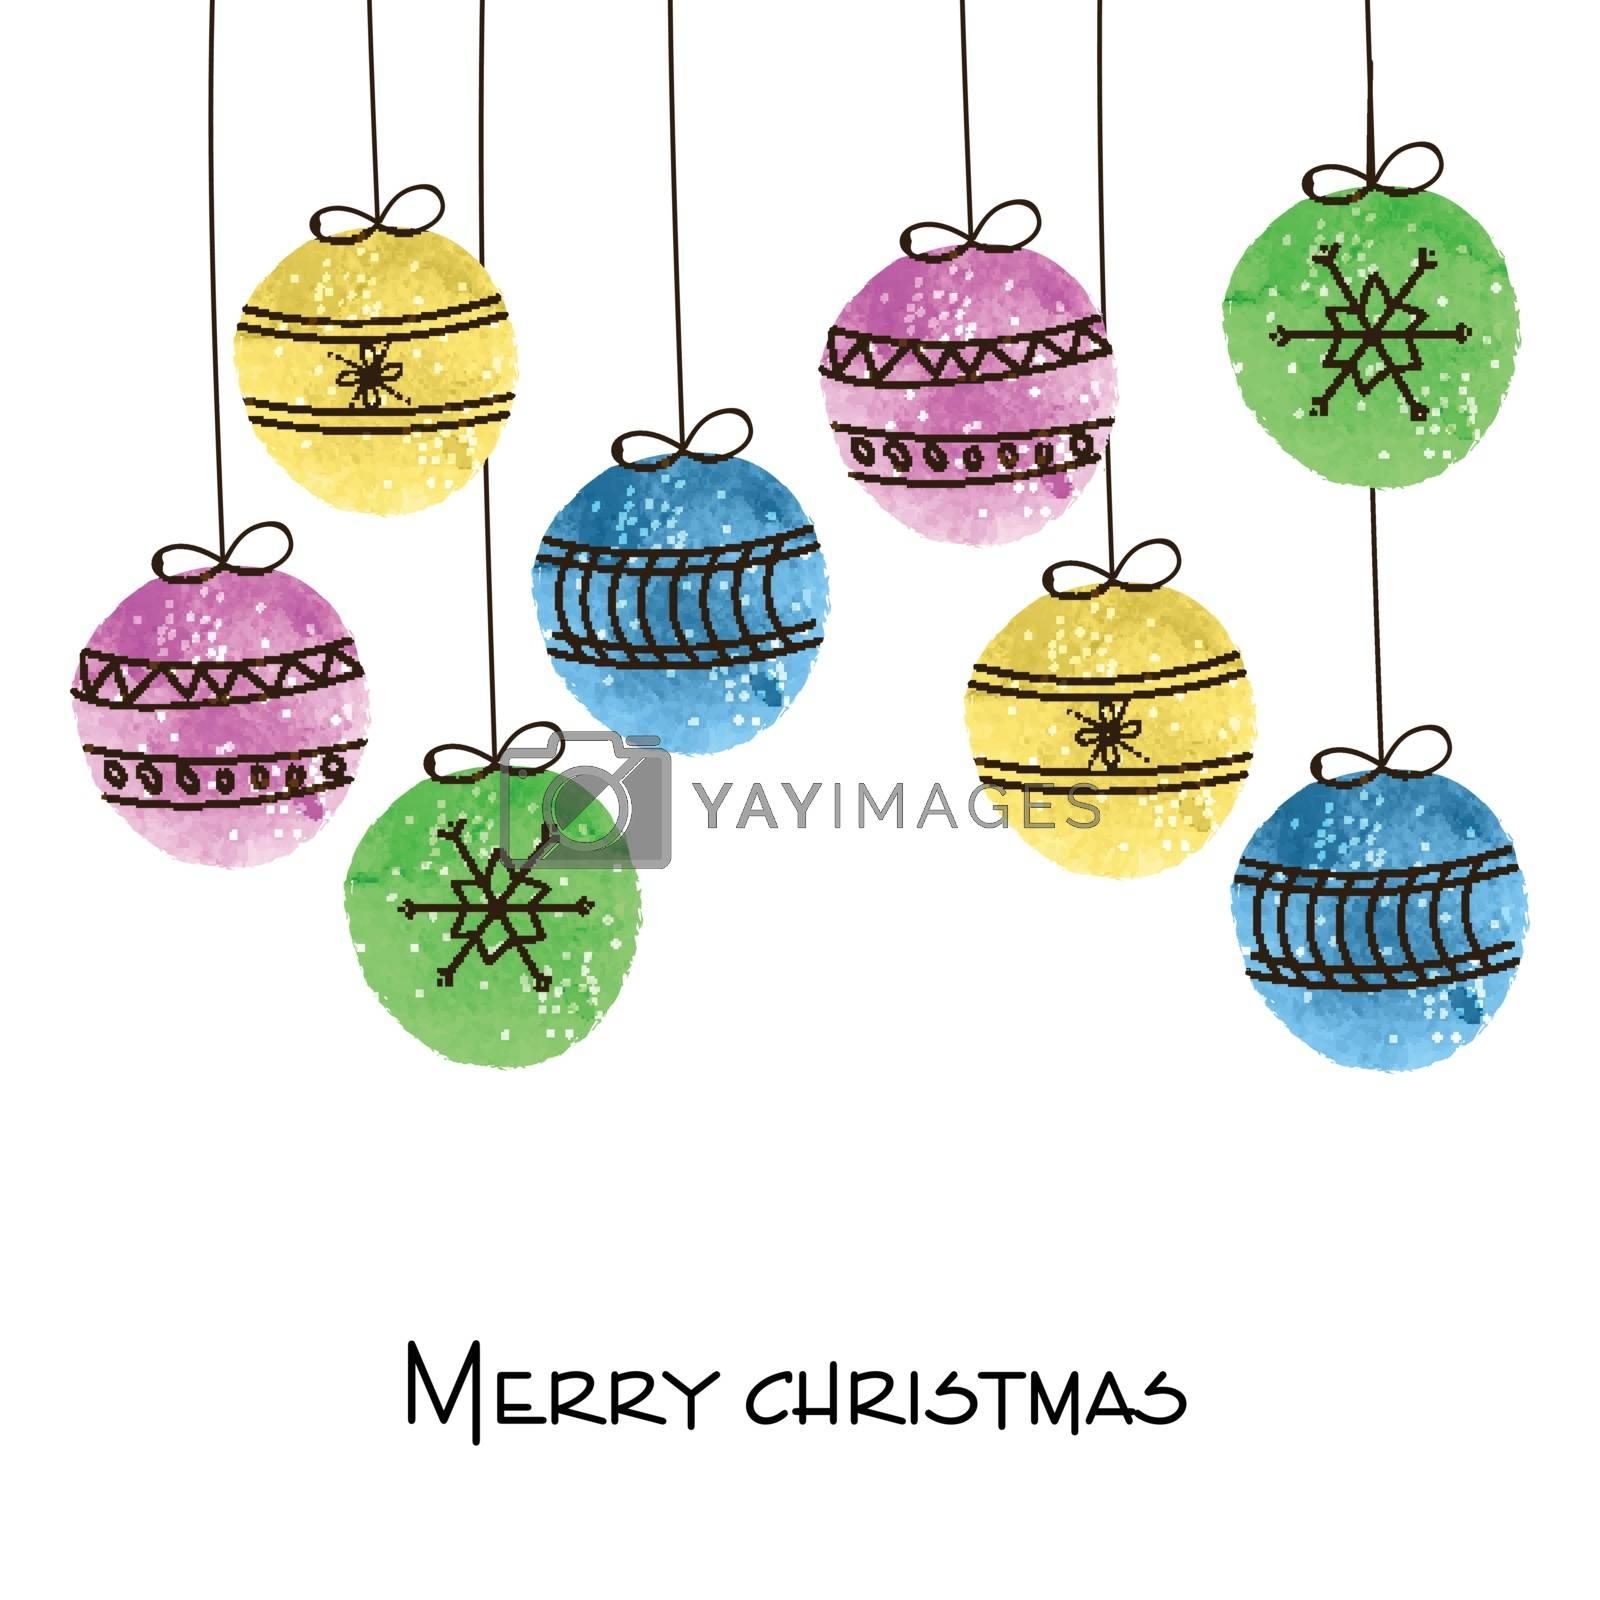 Elegant holiday background with colorful hanging xmas balls for Merry Christmas celebration.